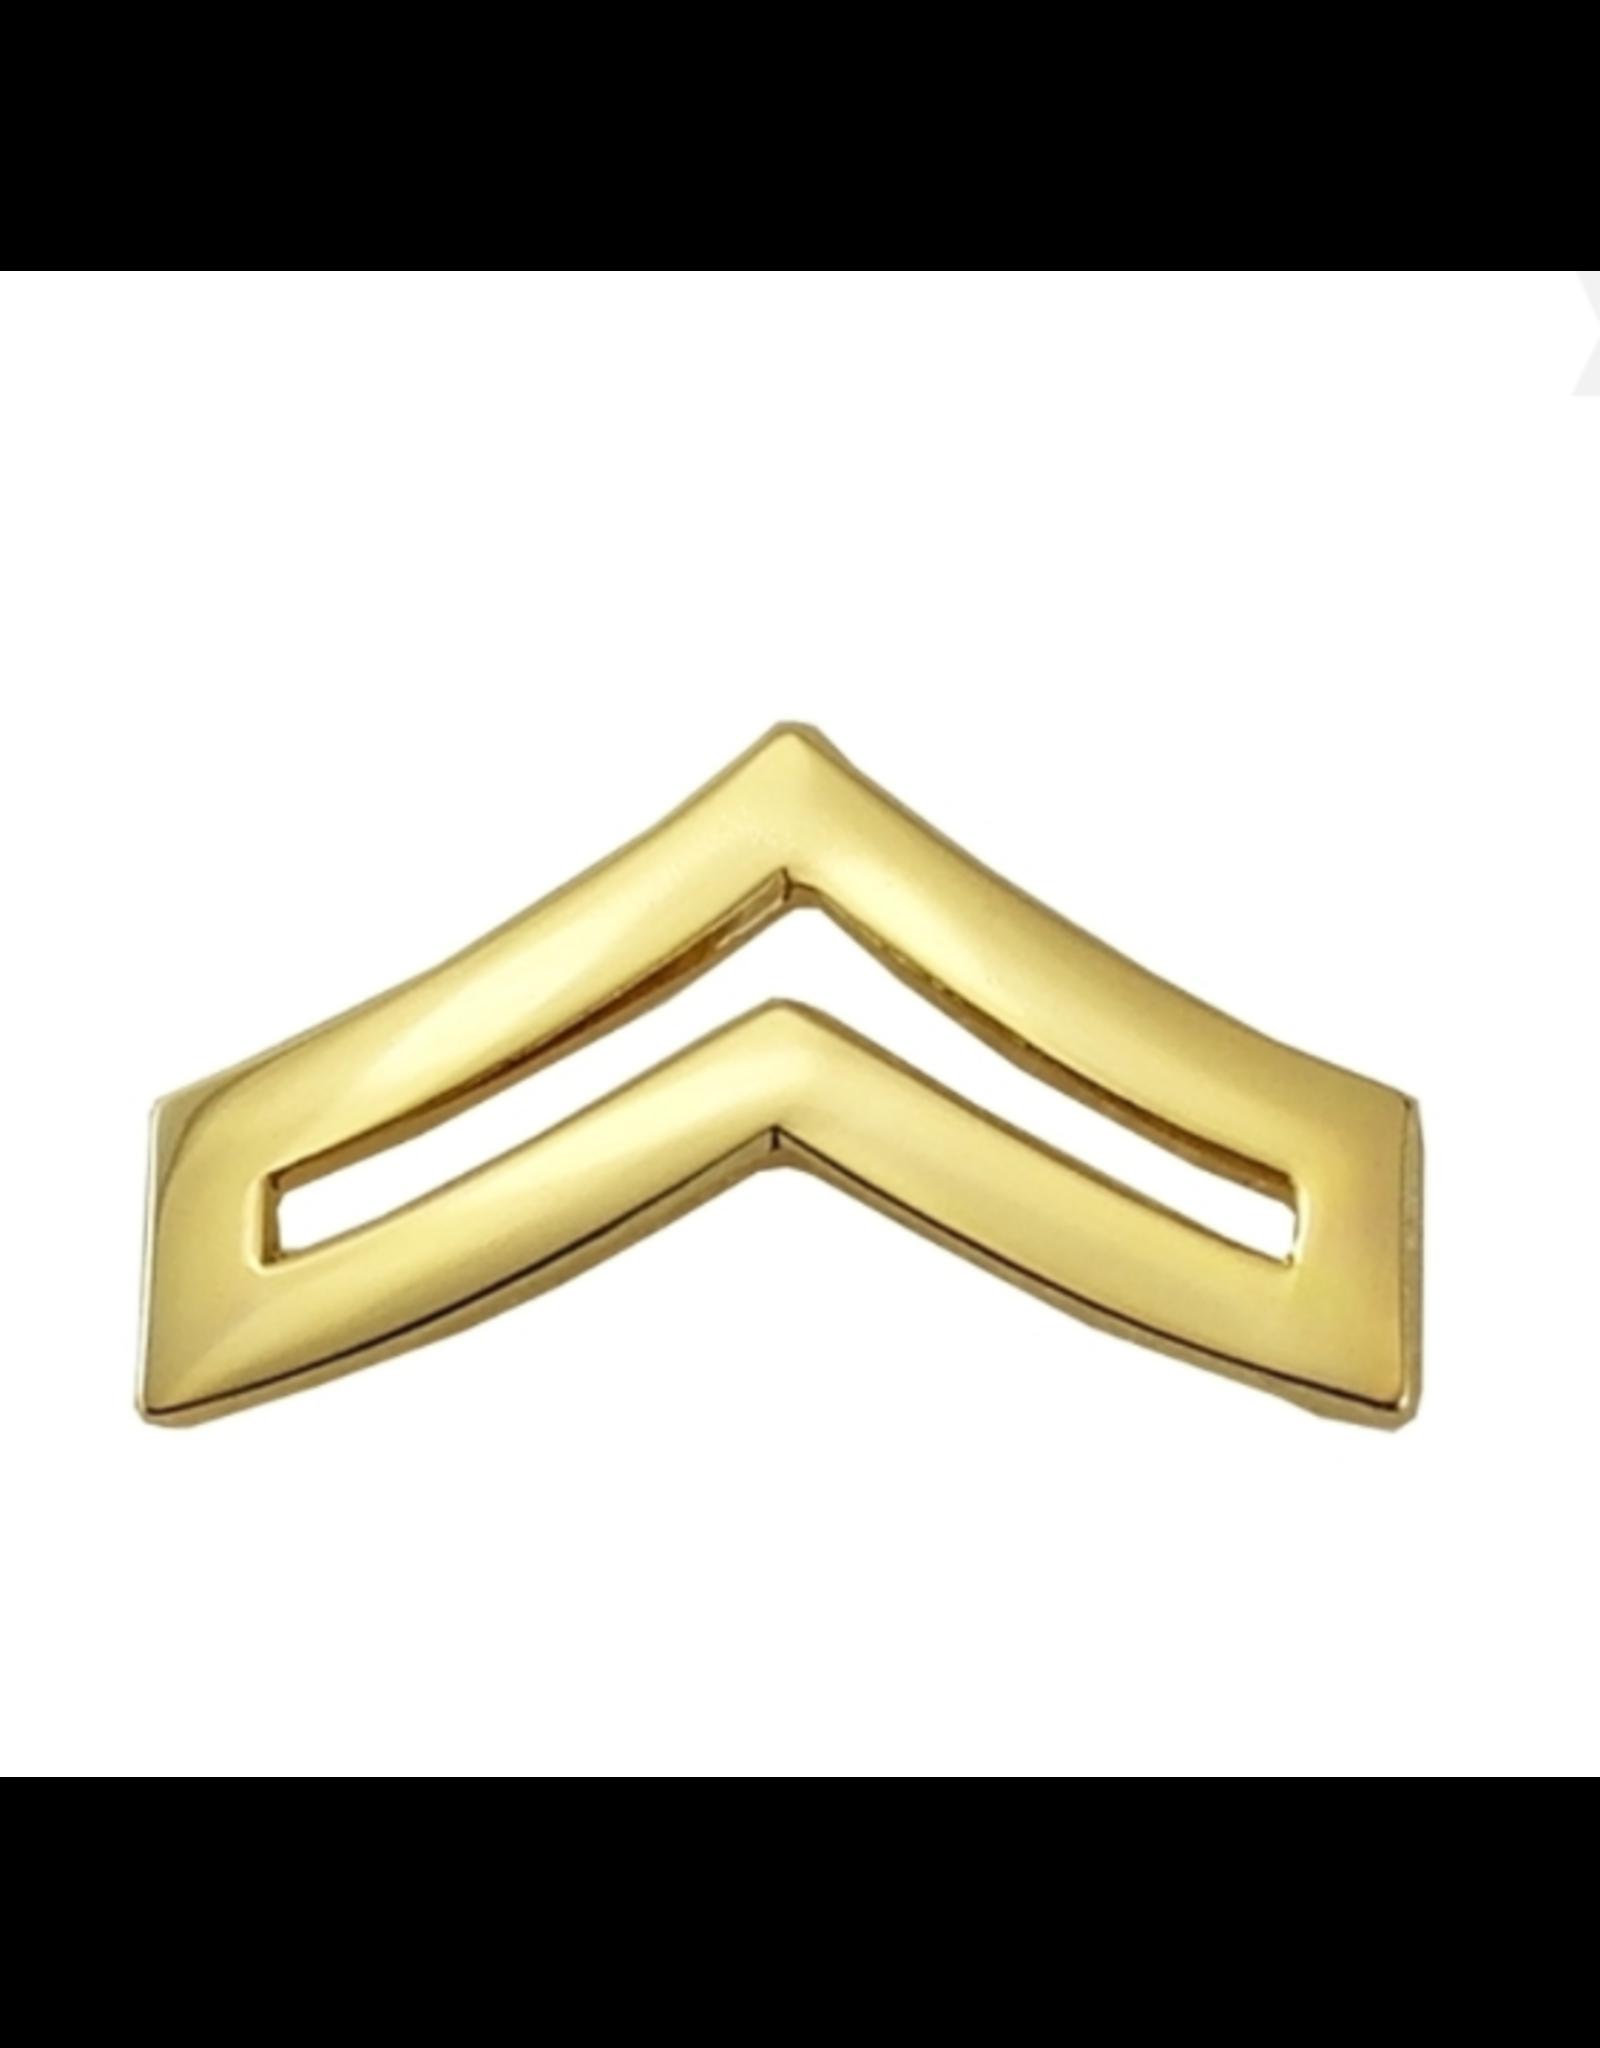 "Hero's Pride Pairs Cpl. Chevron Regular 1"" Gold 2 Clutch"